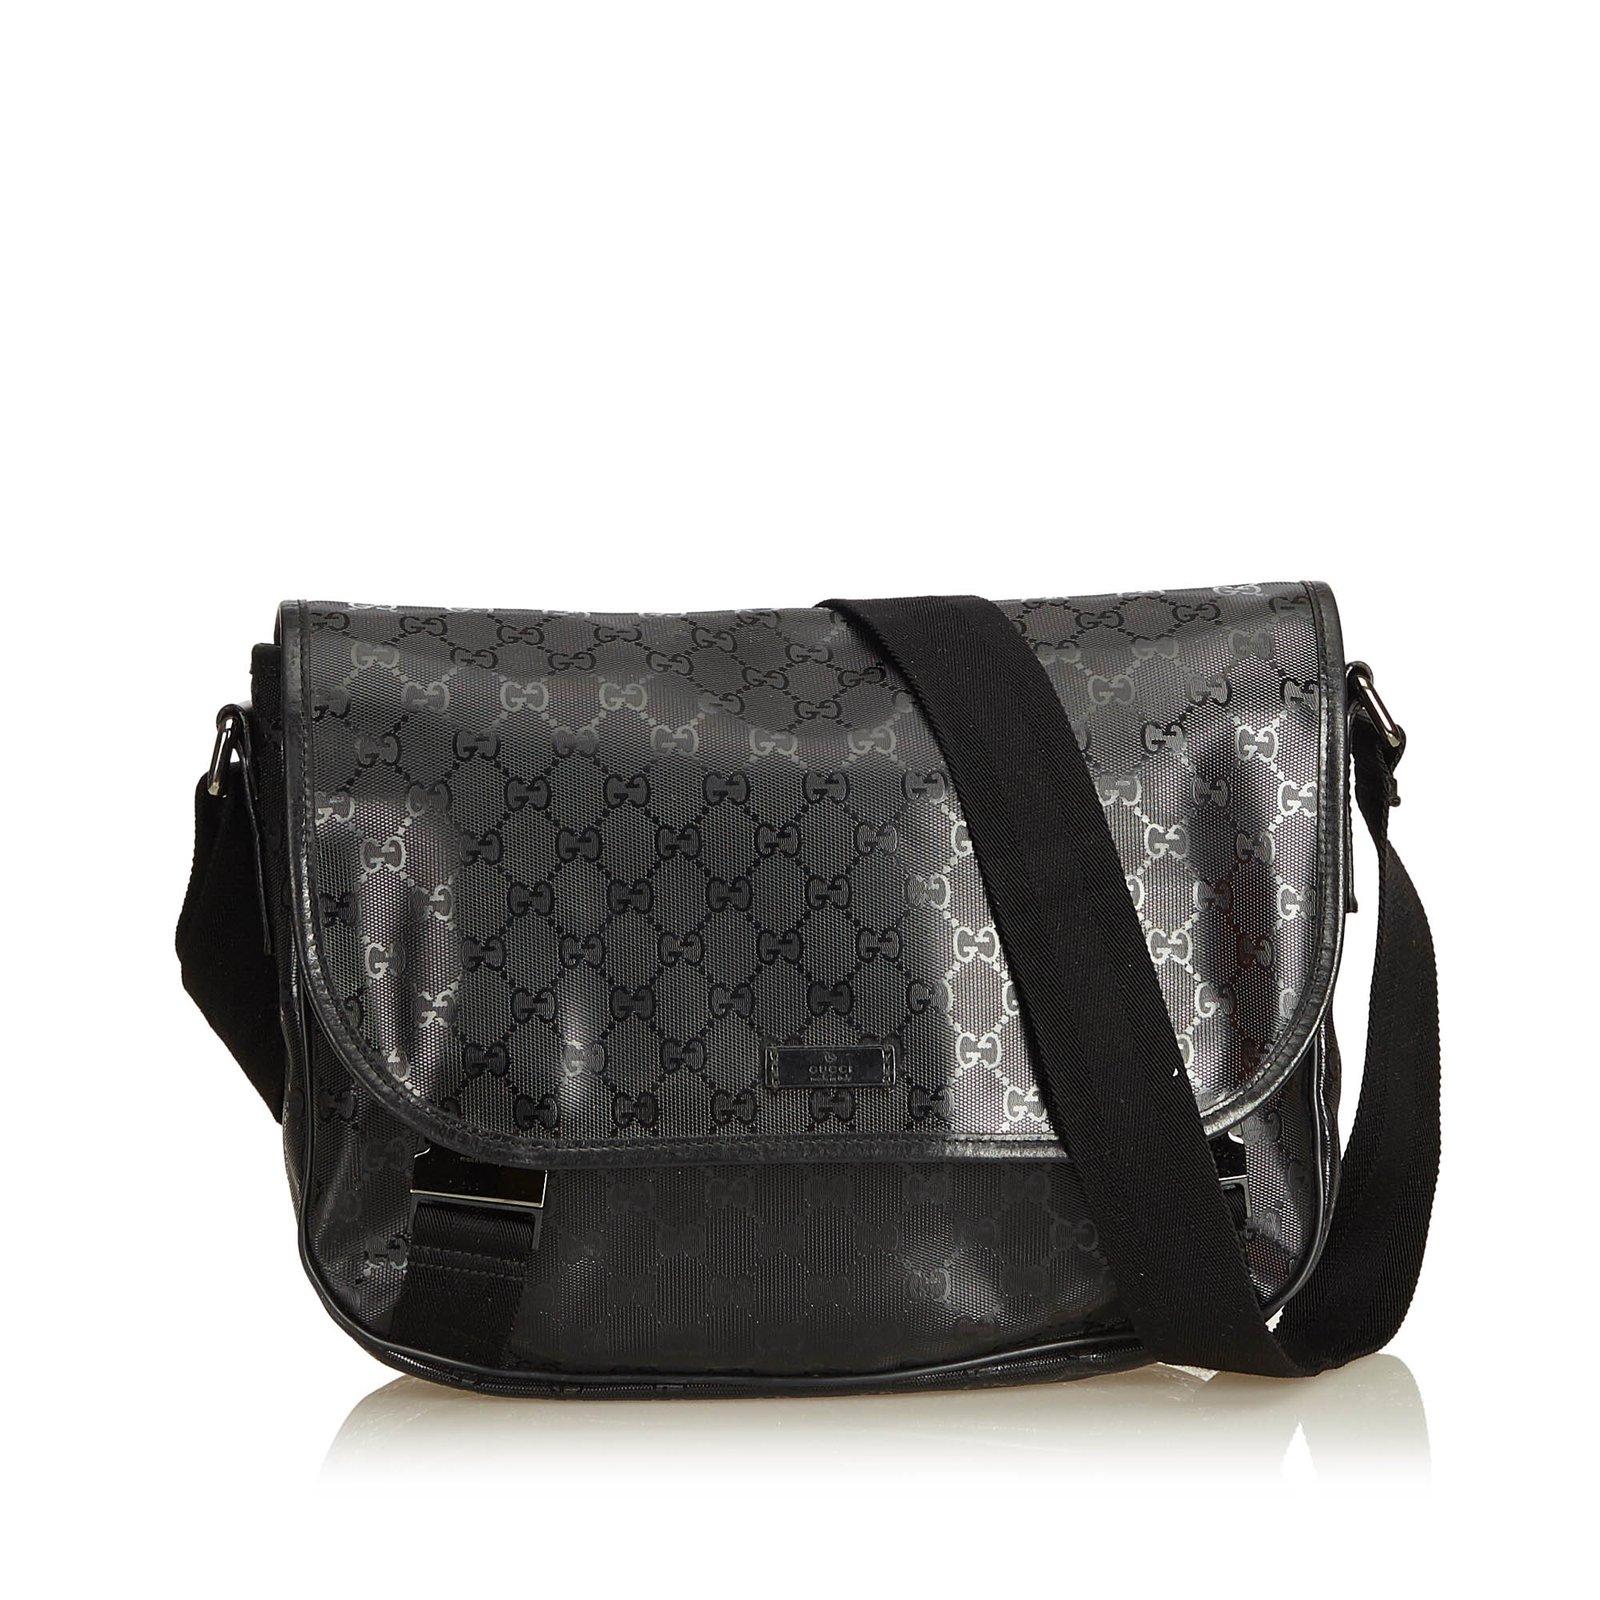 93d971049 Gucci Guccissima Imprime Messenger Bag Handbags Leather,Other,Plastic Black  ref.94744